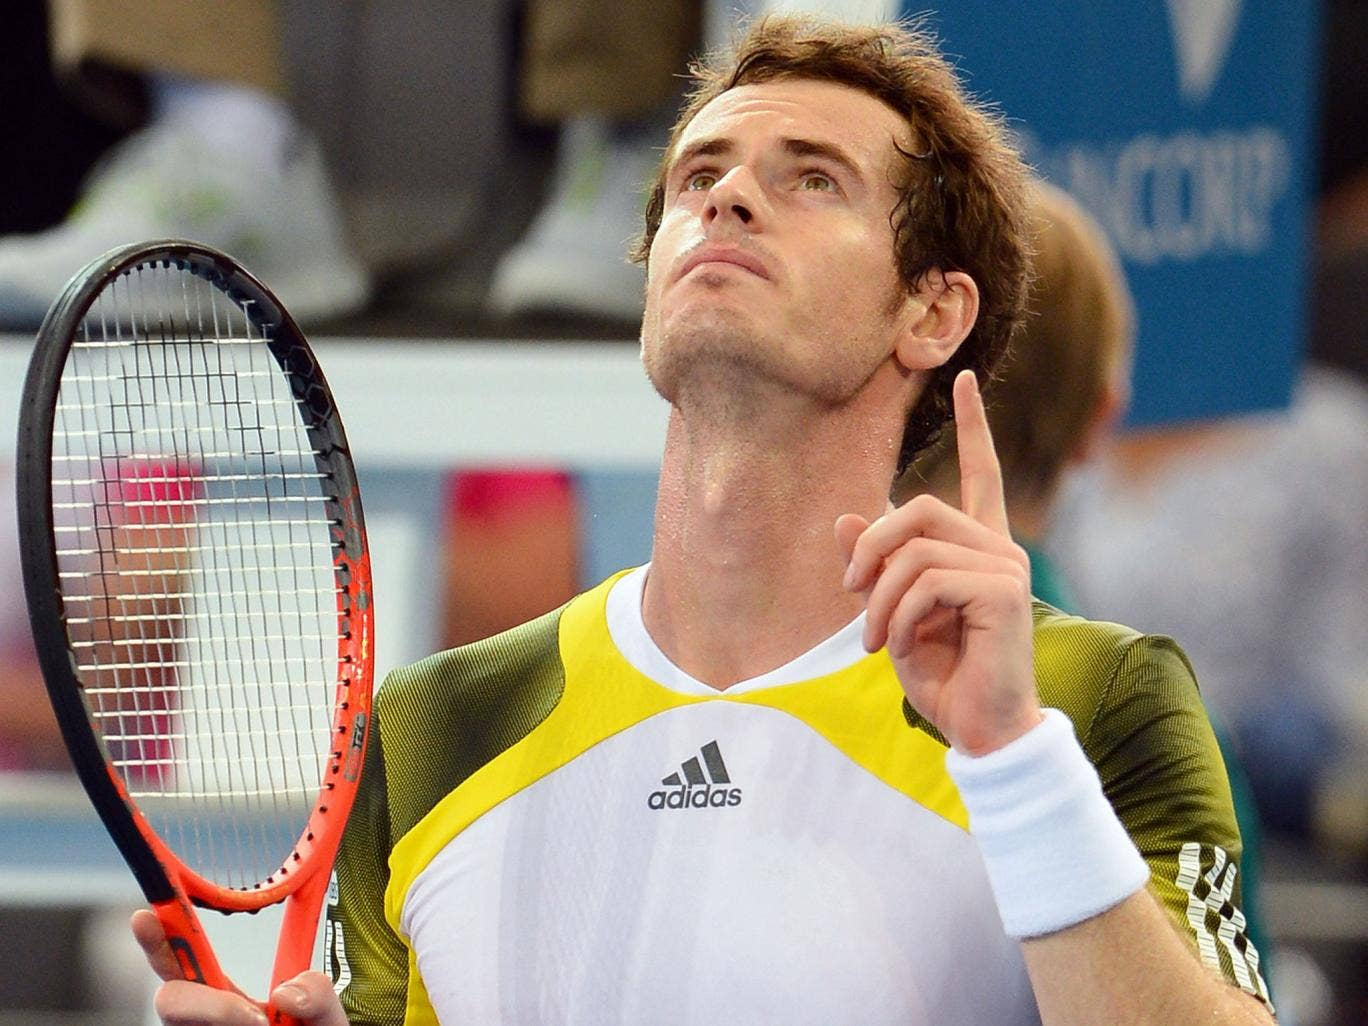 Murray is second favourite, behind Novak Djokovic, to win the Australian Open